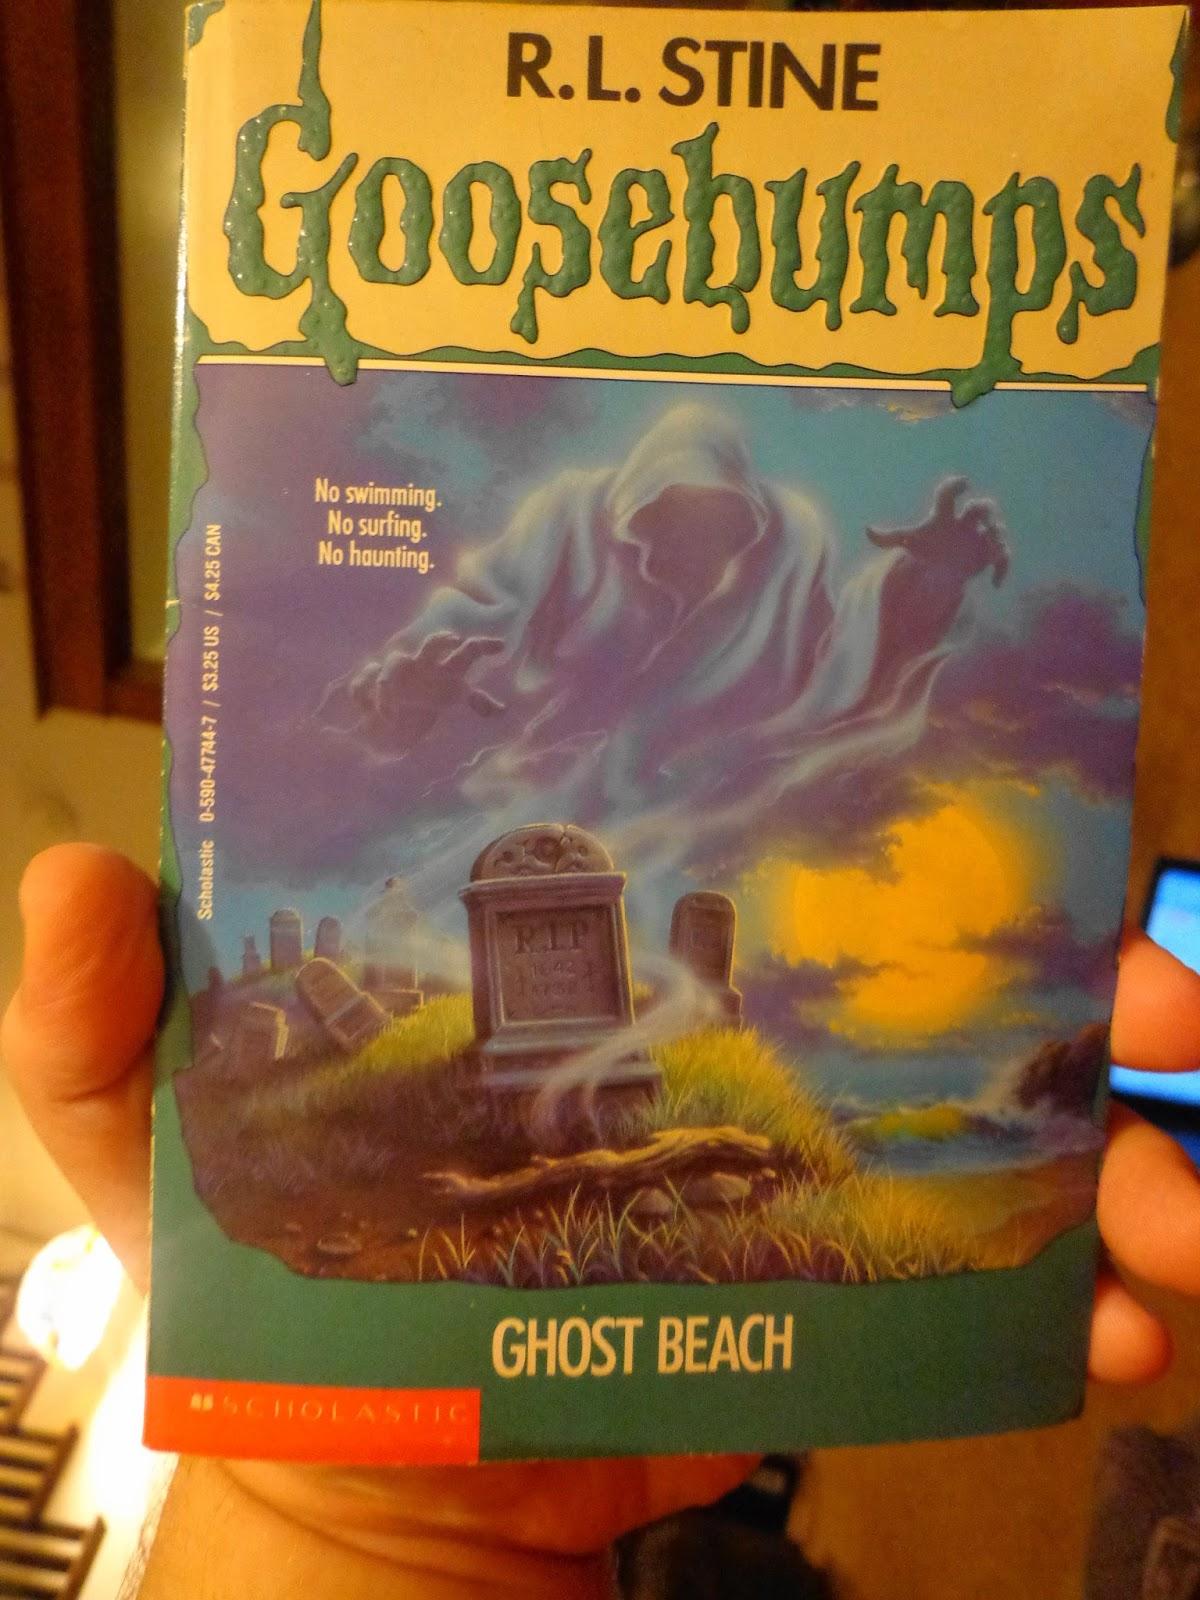 Goosebumps Ghost Beach | www.imgkid.com - The Image Kid ... Goosebumps Ghost Beach Dvd